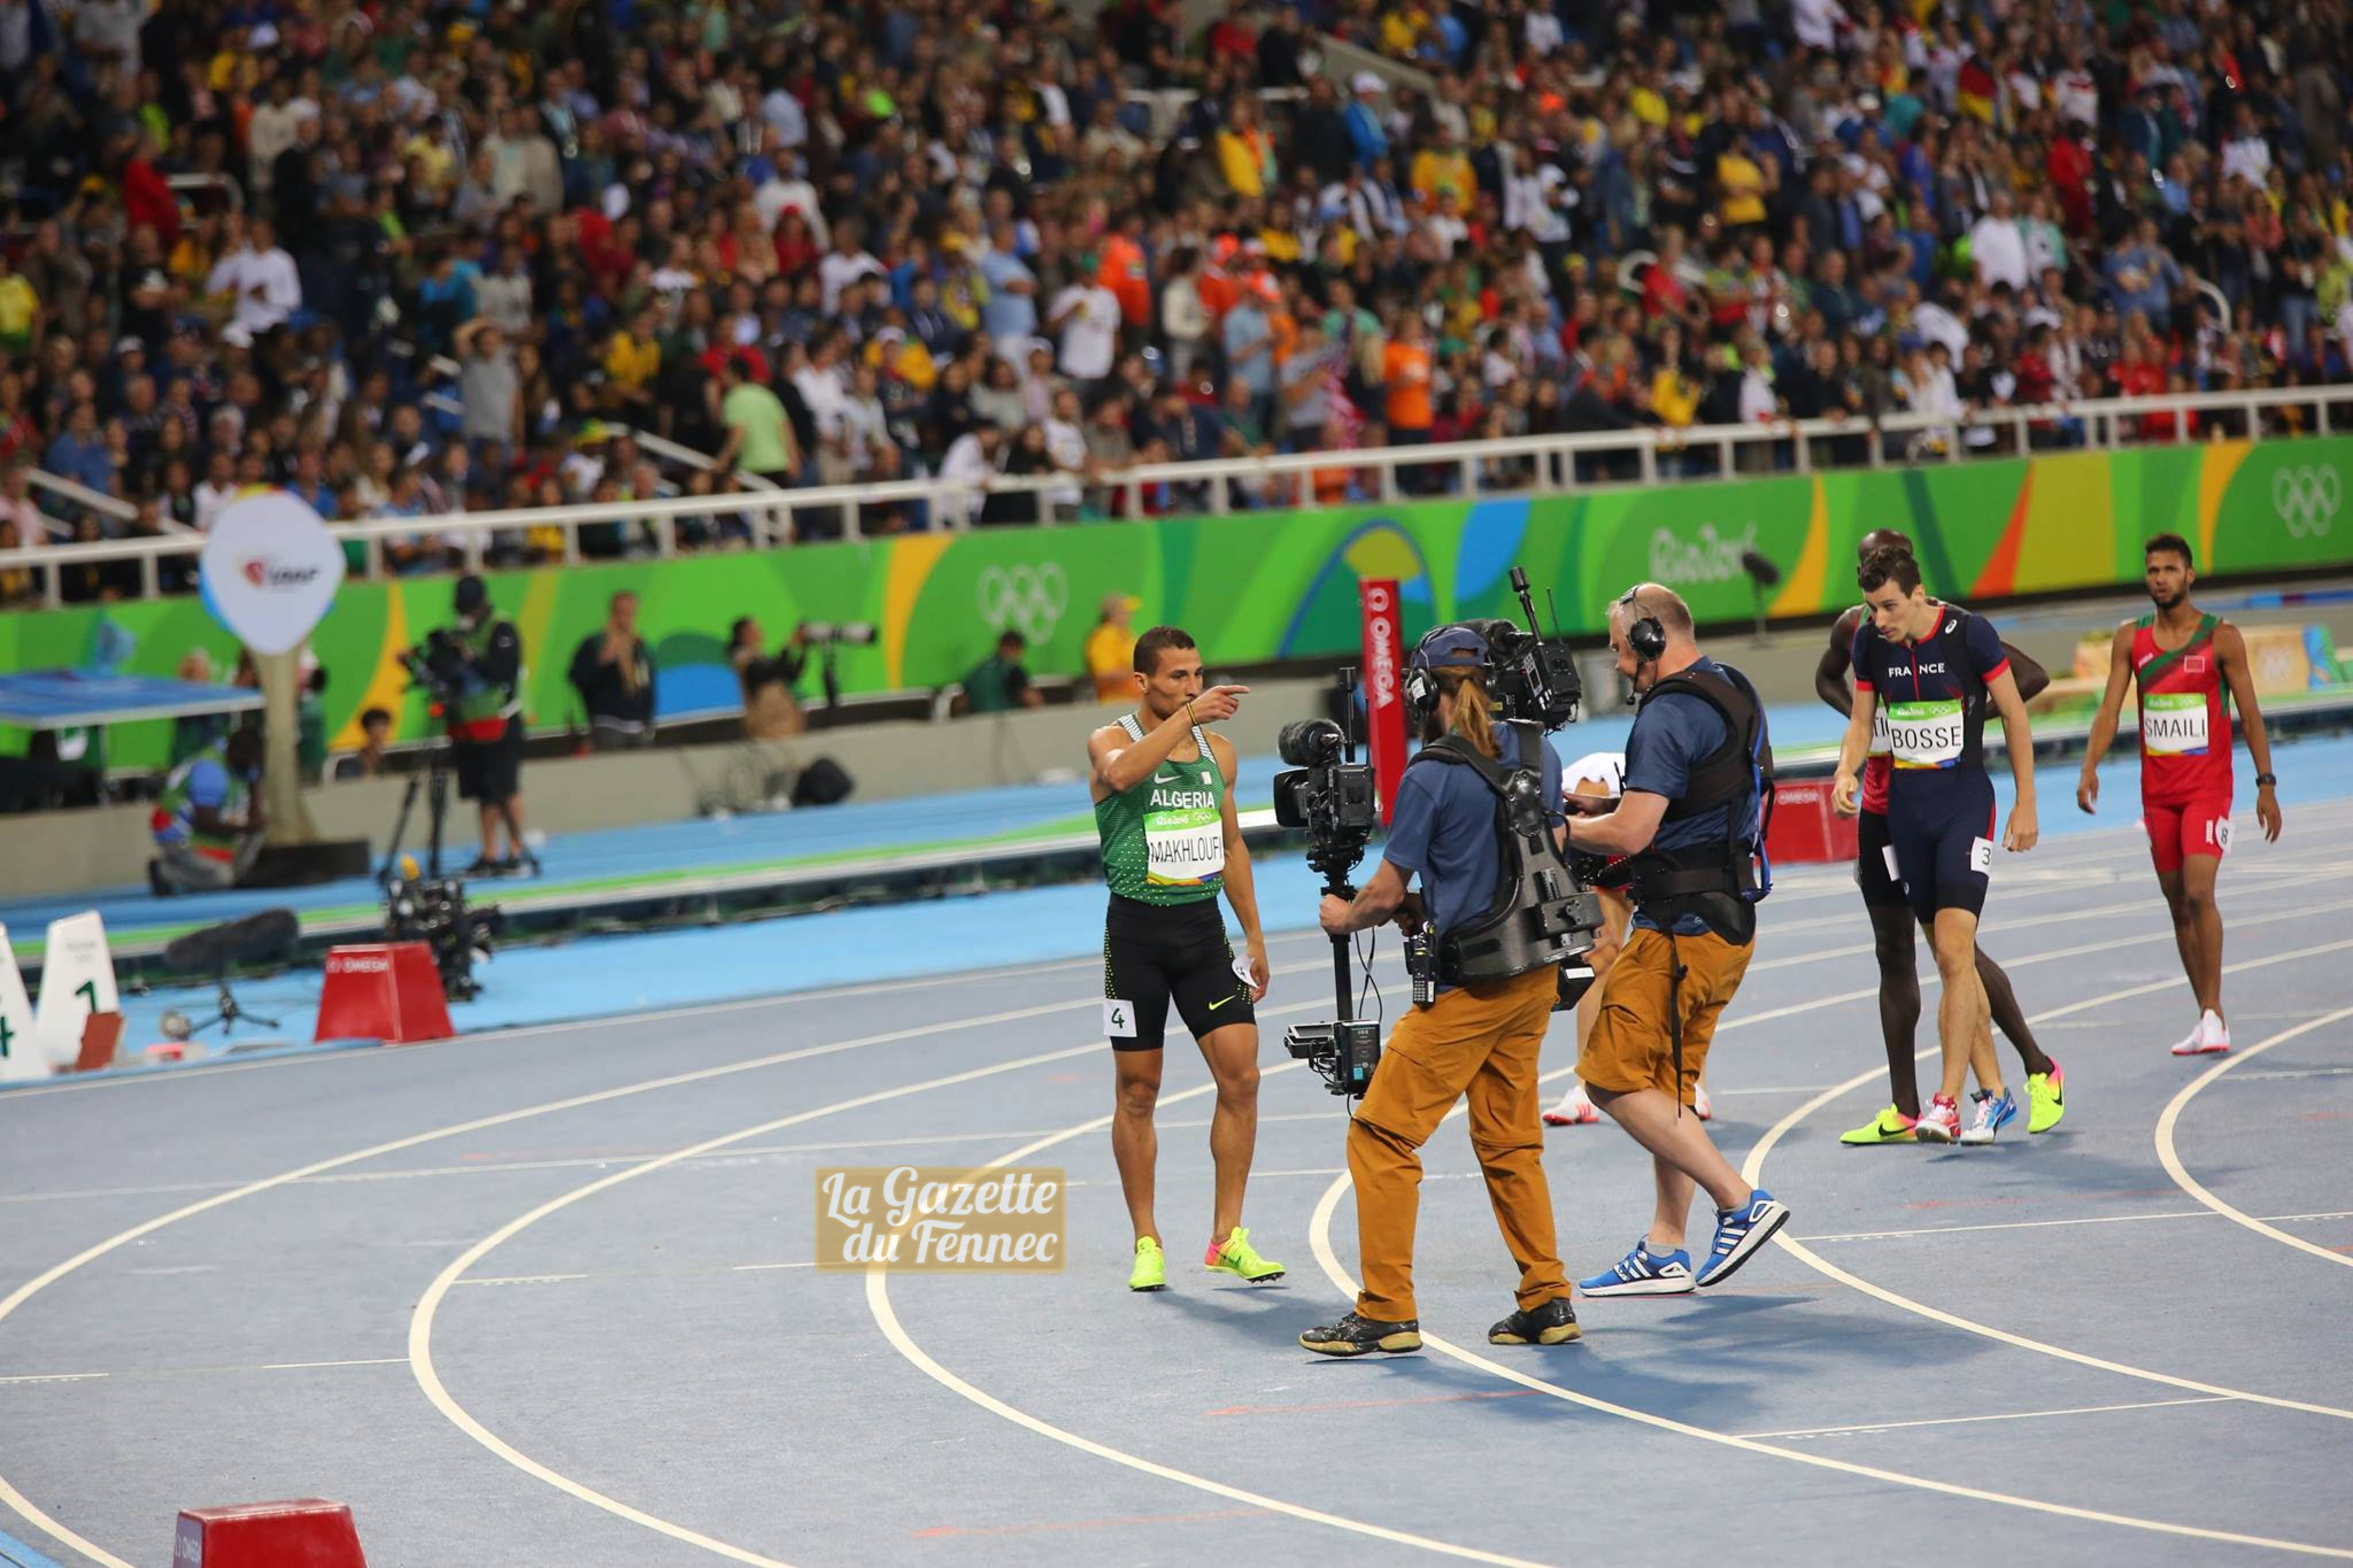 makhloufi camera fin de course 800m